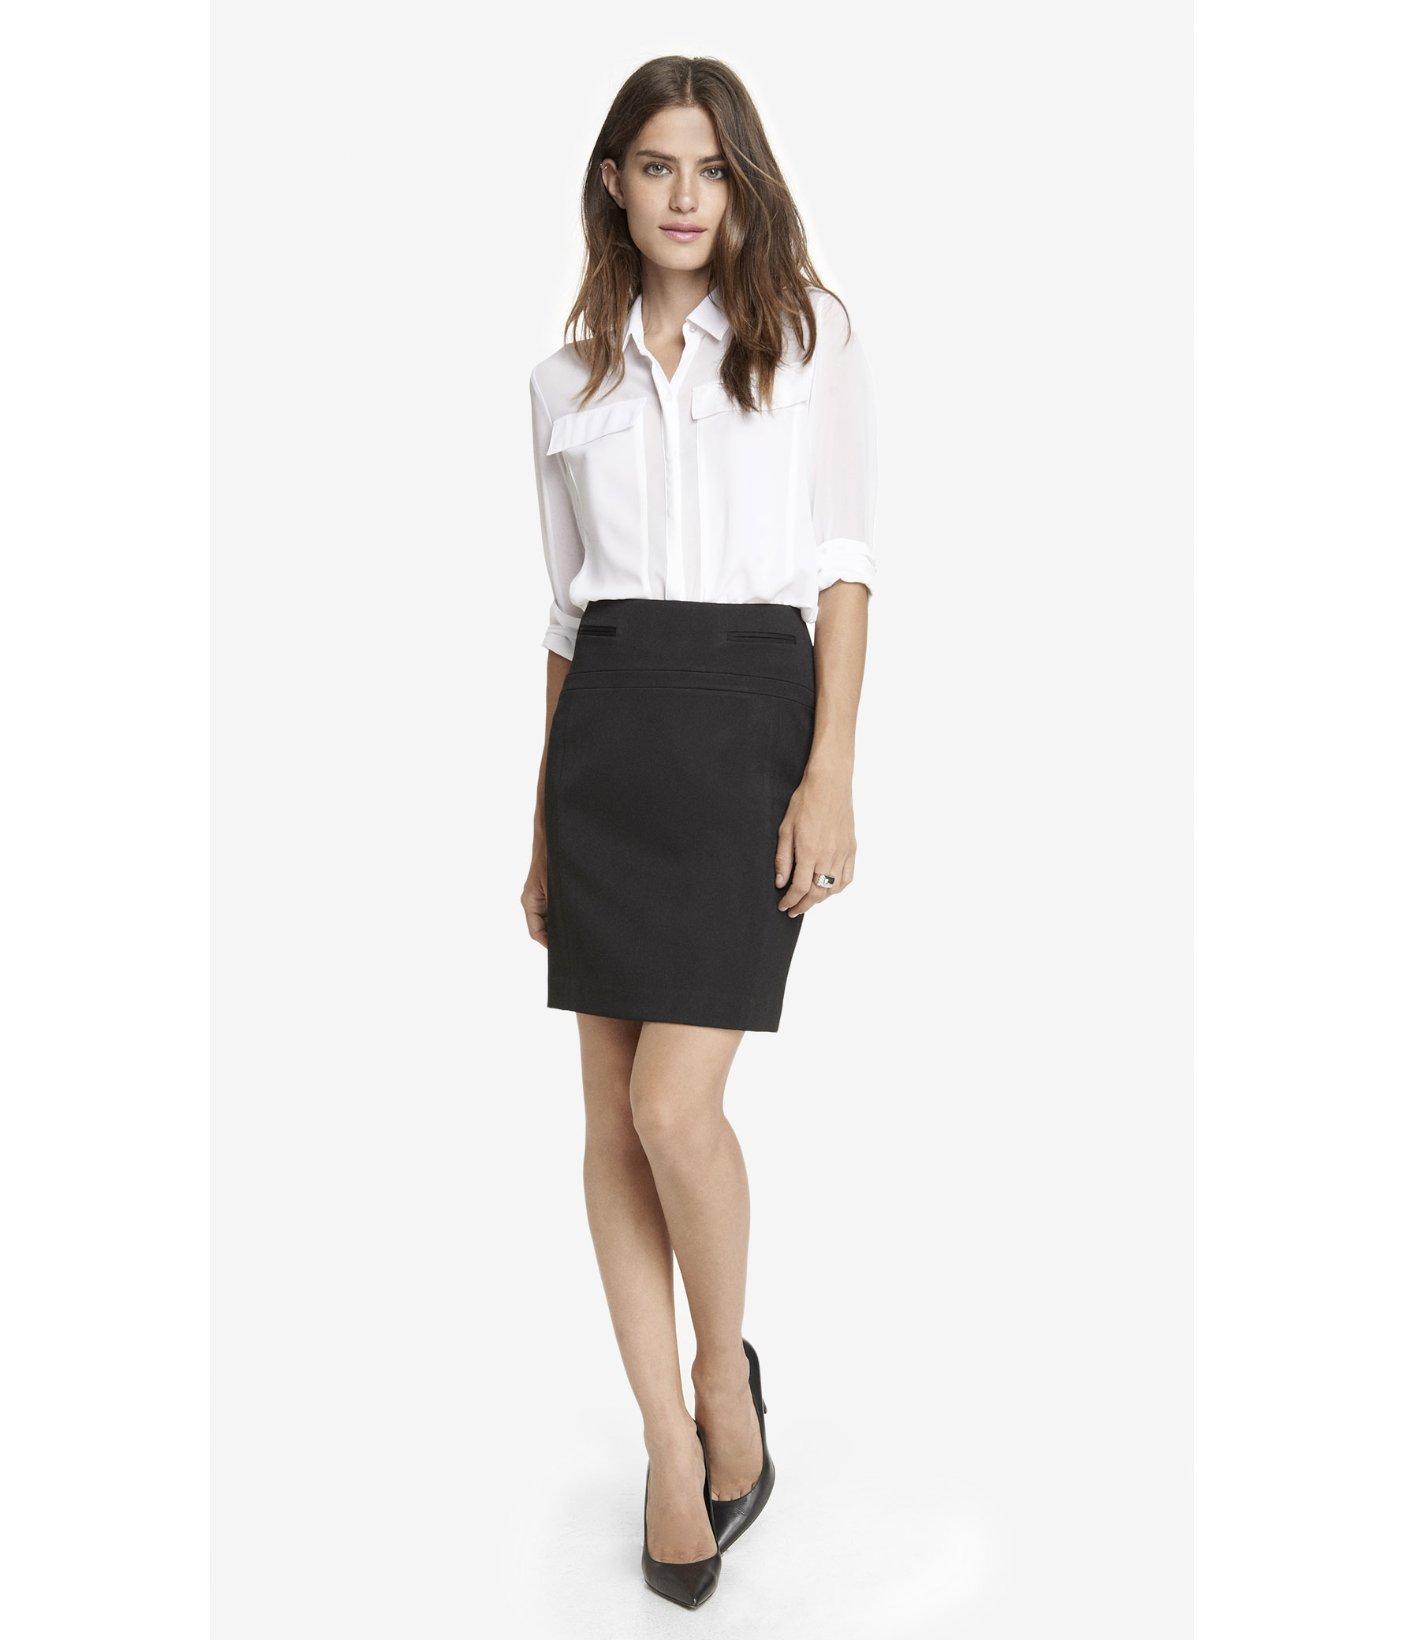 7a2c69c2f5e4 Lyst - Express Studio Stretch Welt Pocket Pencil Skirt in Black